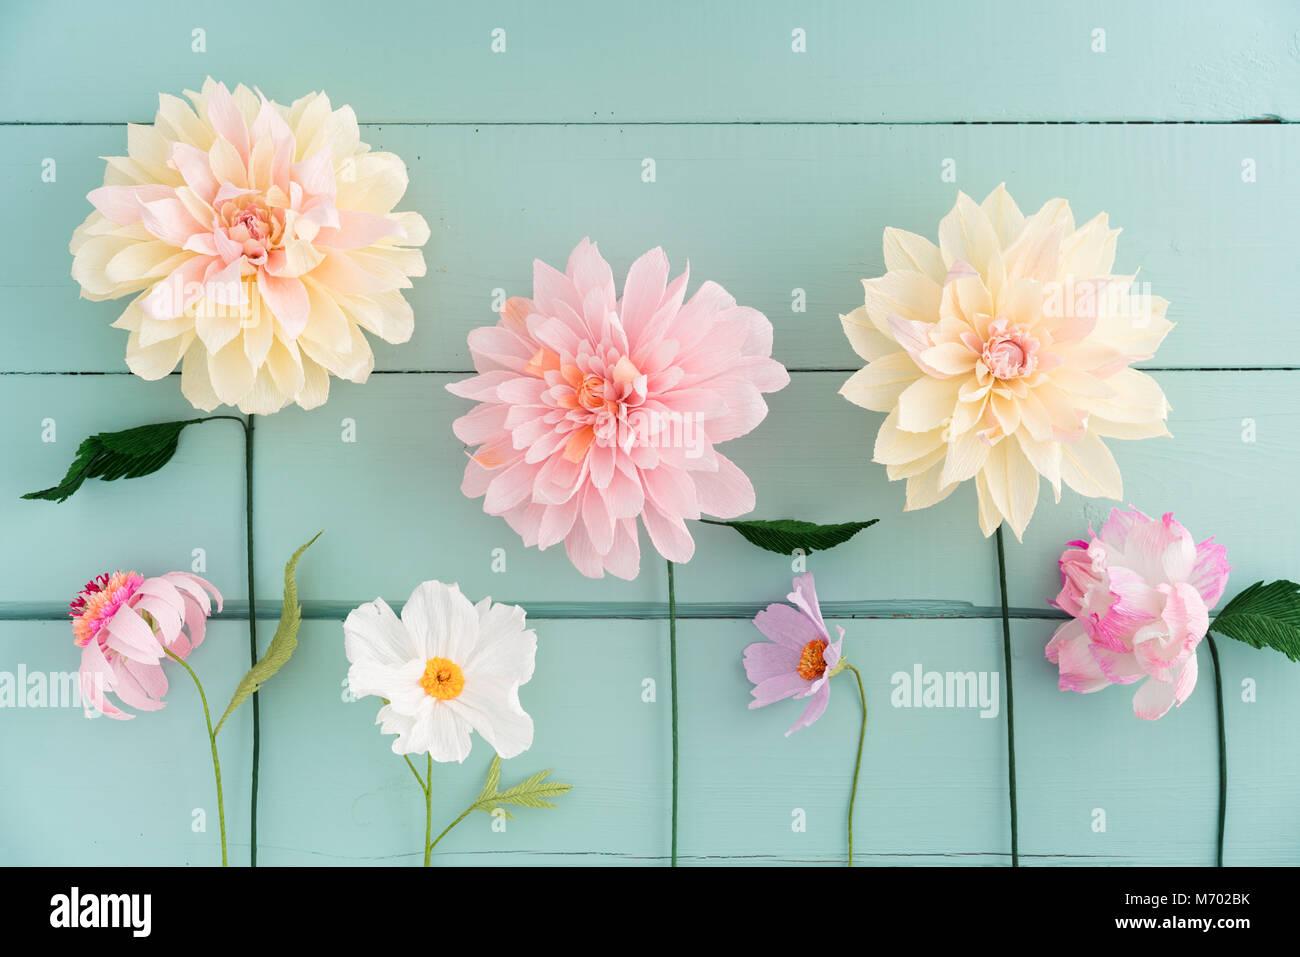 Crepe Paper Flowers Stock Photo 176408167 Alamy